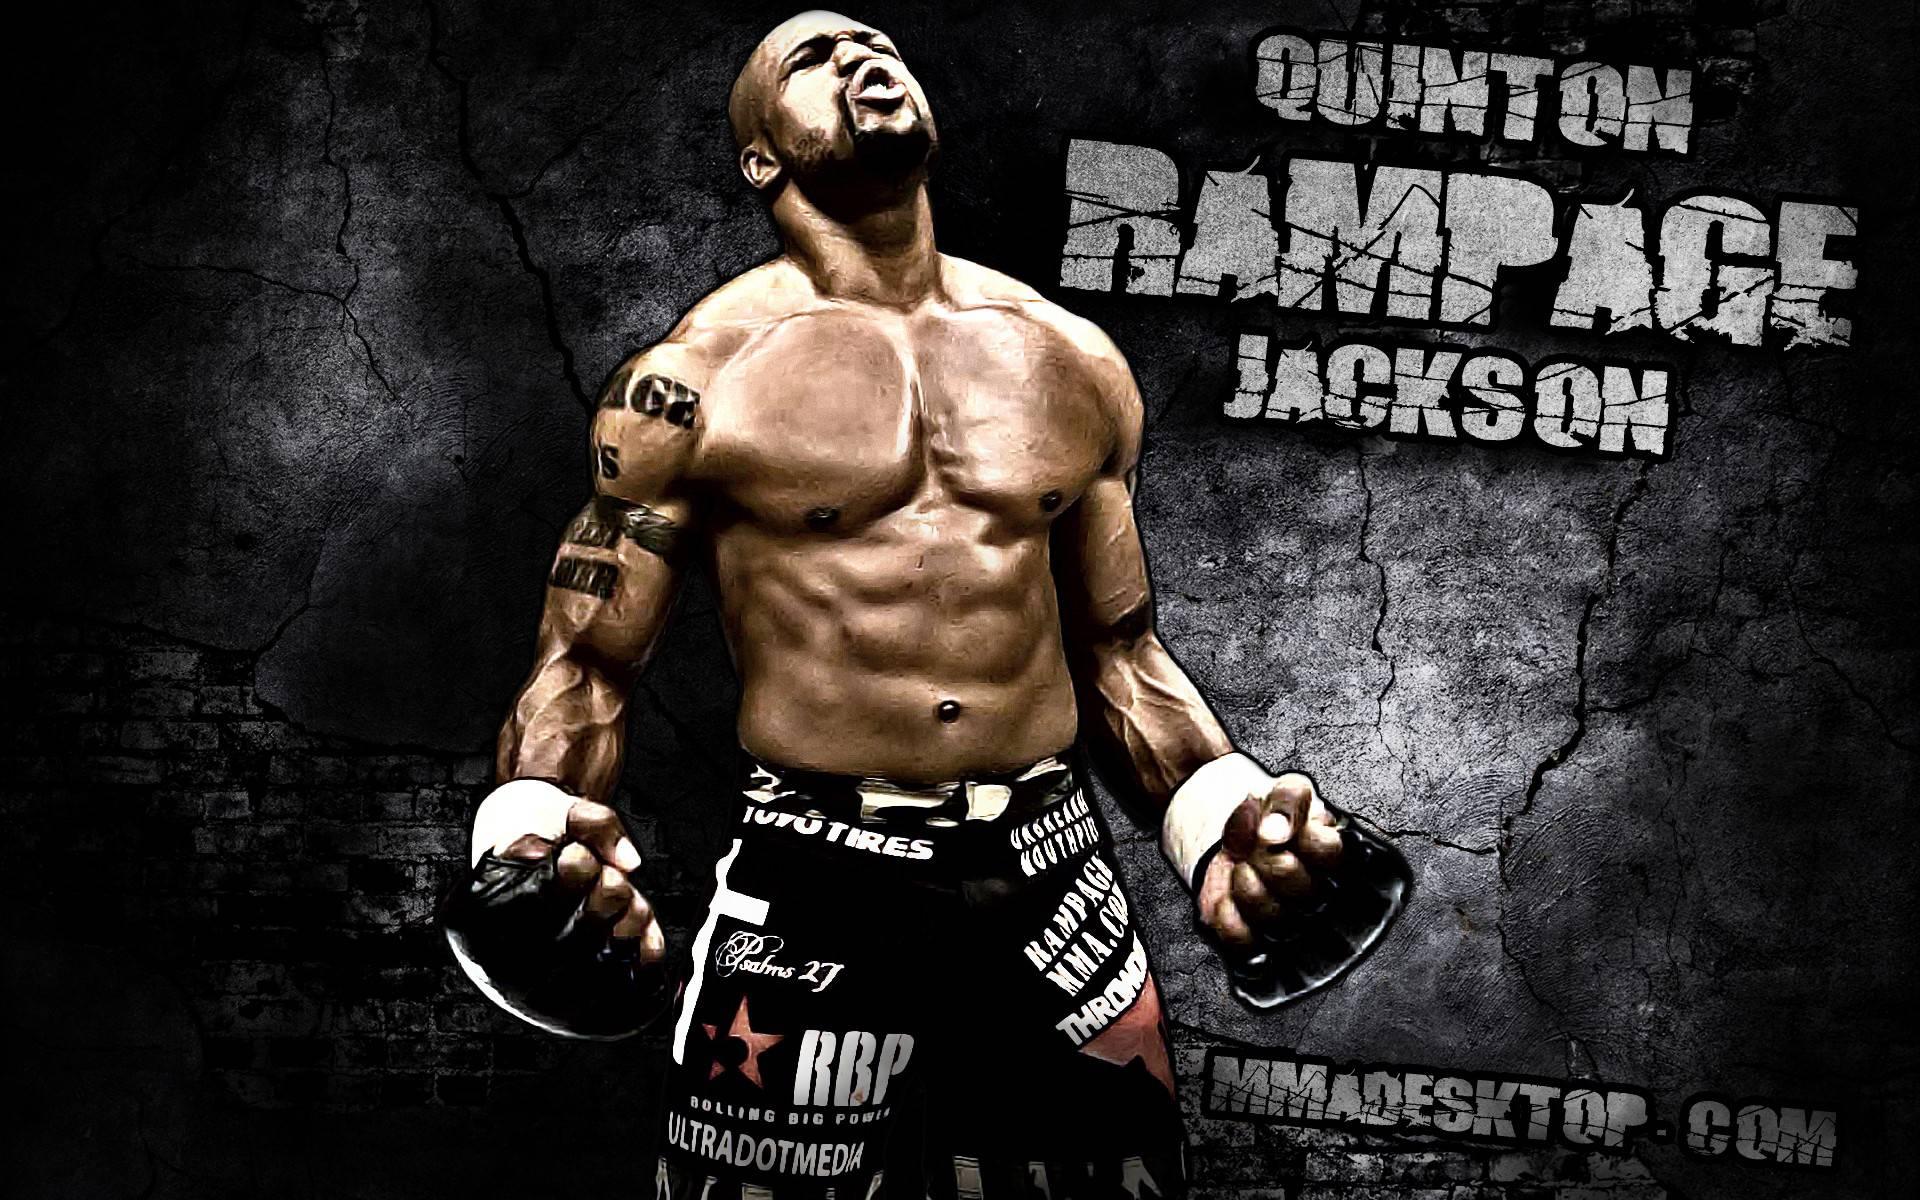 UFC mixed martial arts mma fight extreme wallpaper 1920x1200 85513 1920x1200